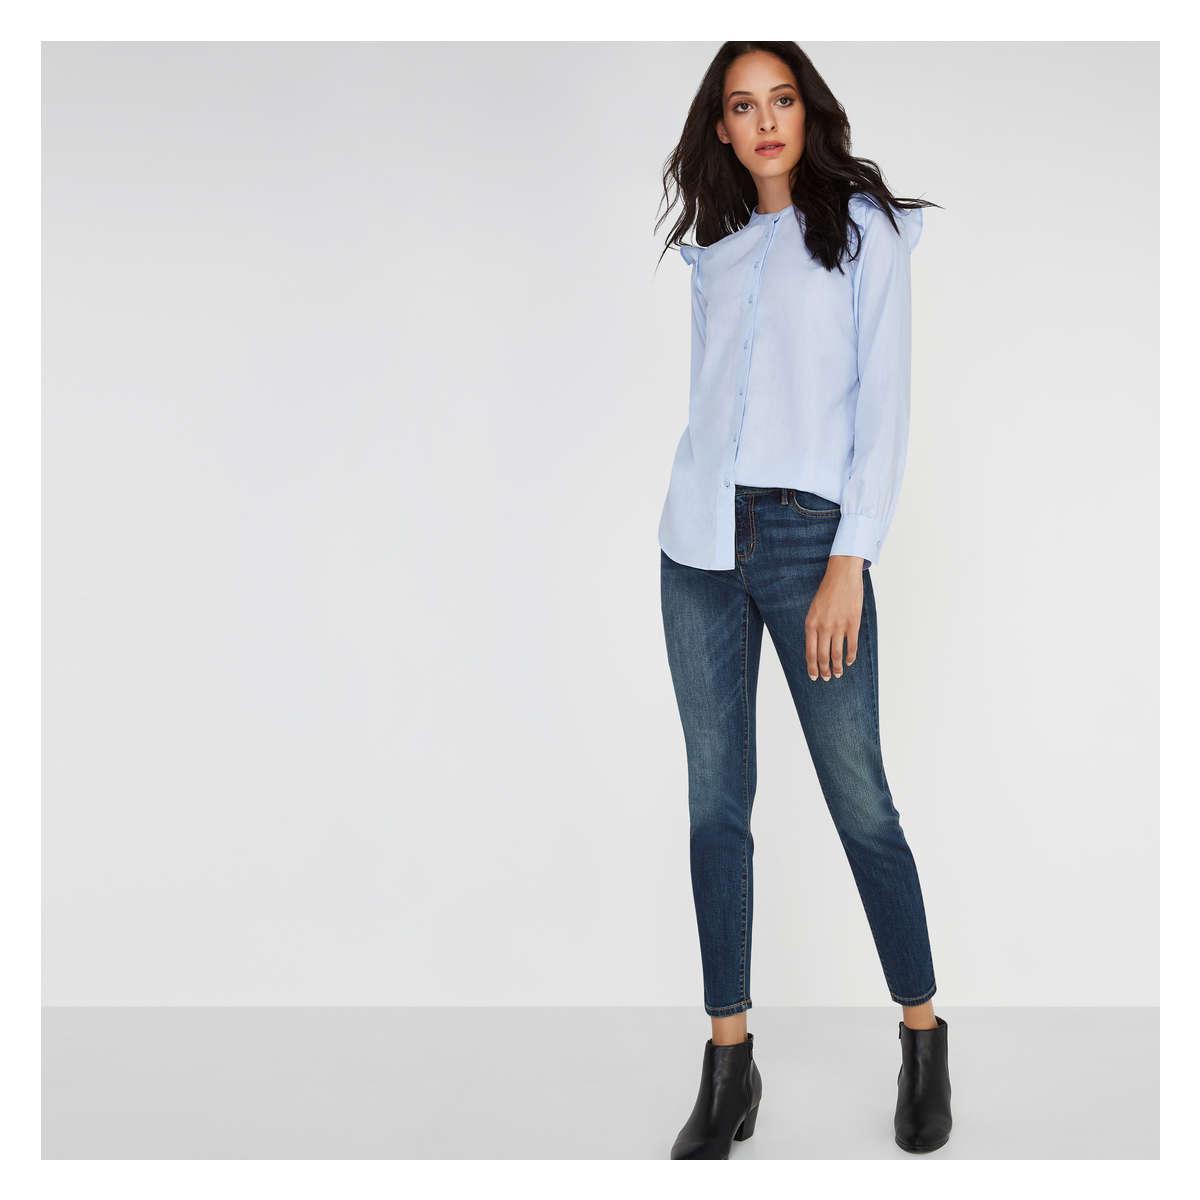 41360300485 Lyst - Joe Fresh Classic Slim Fit Jean in Blue